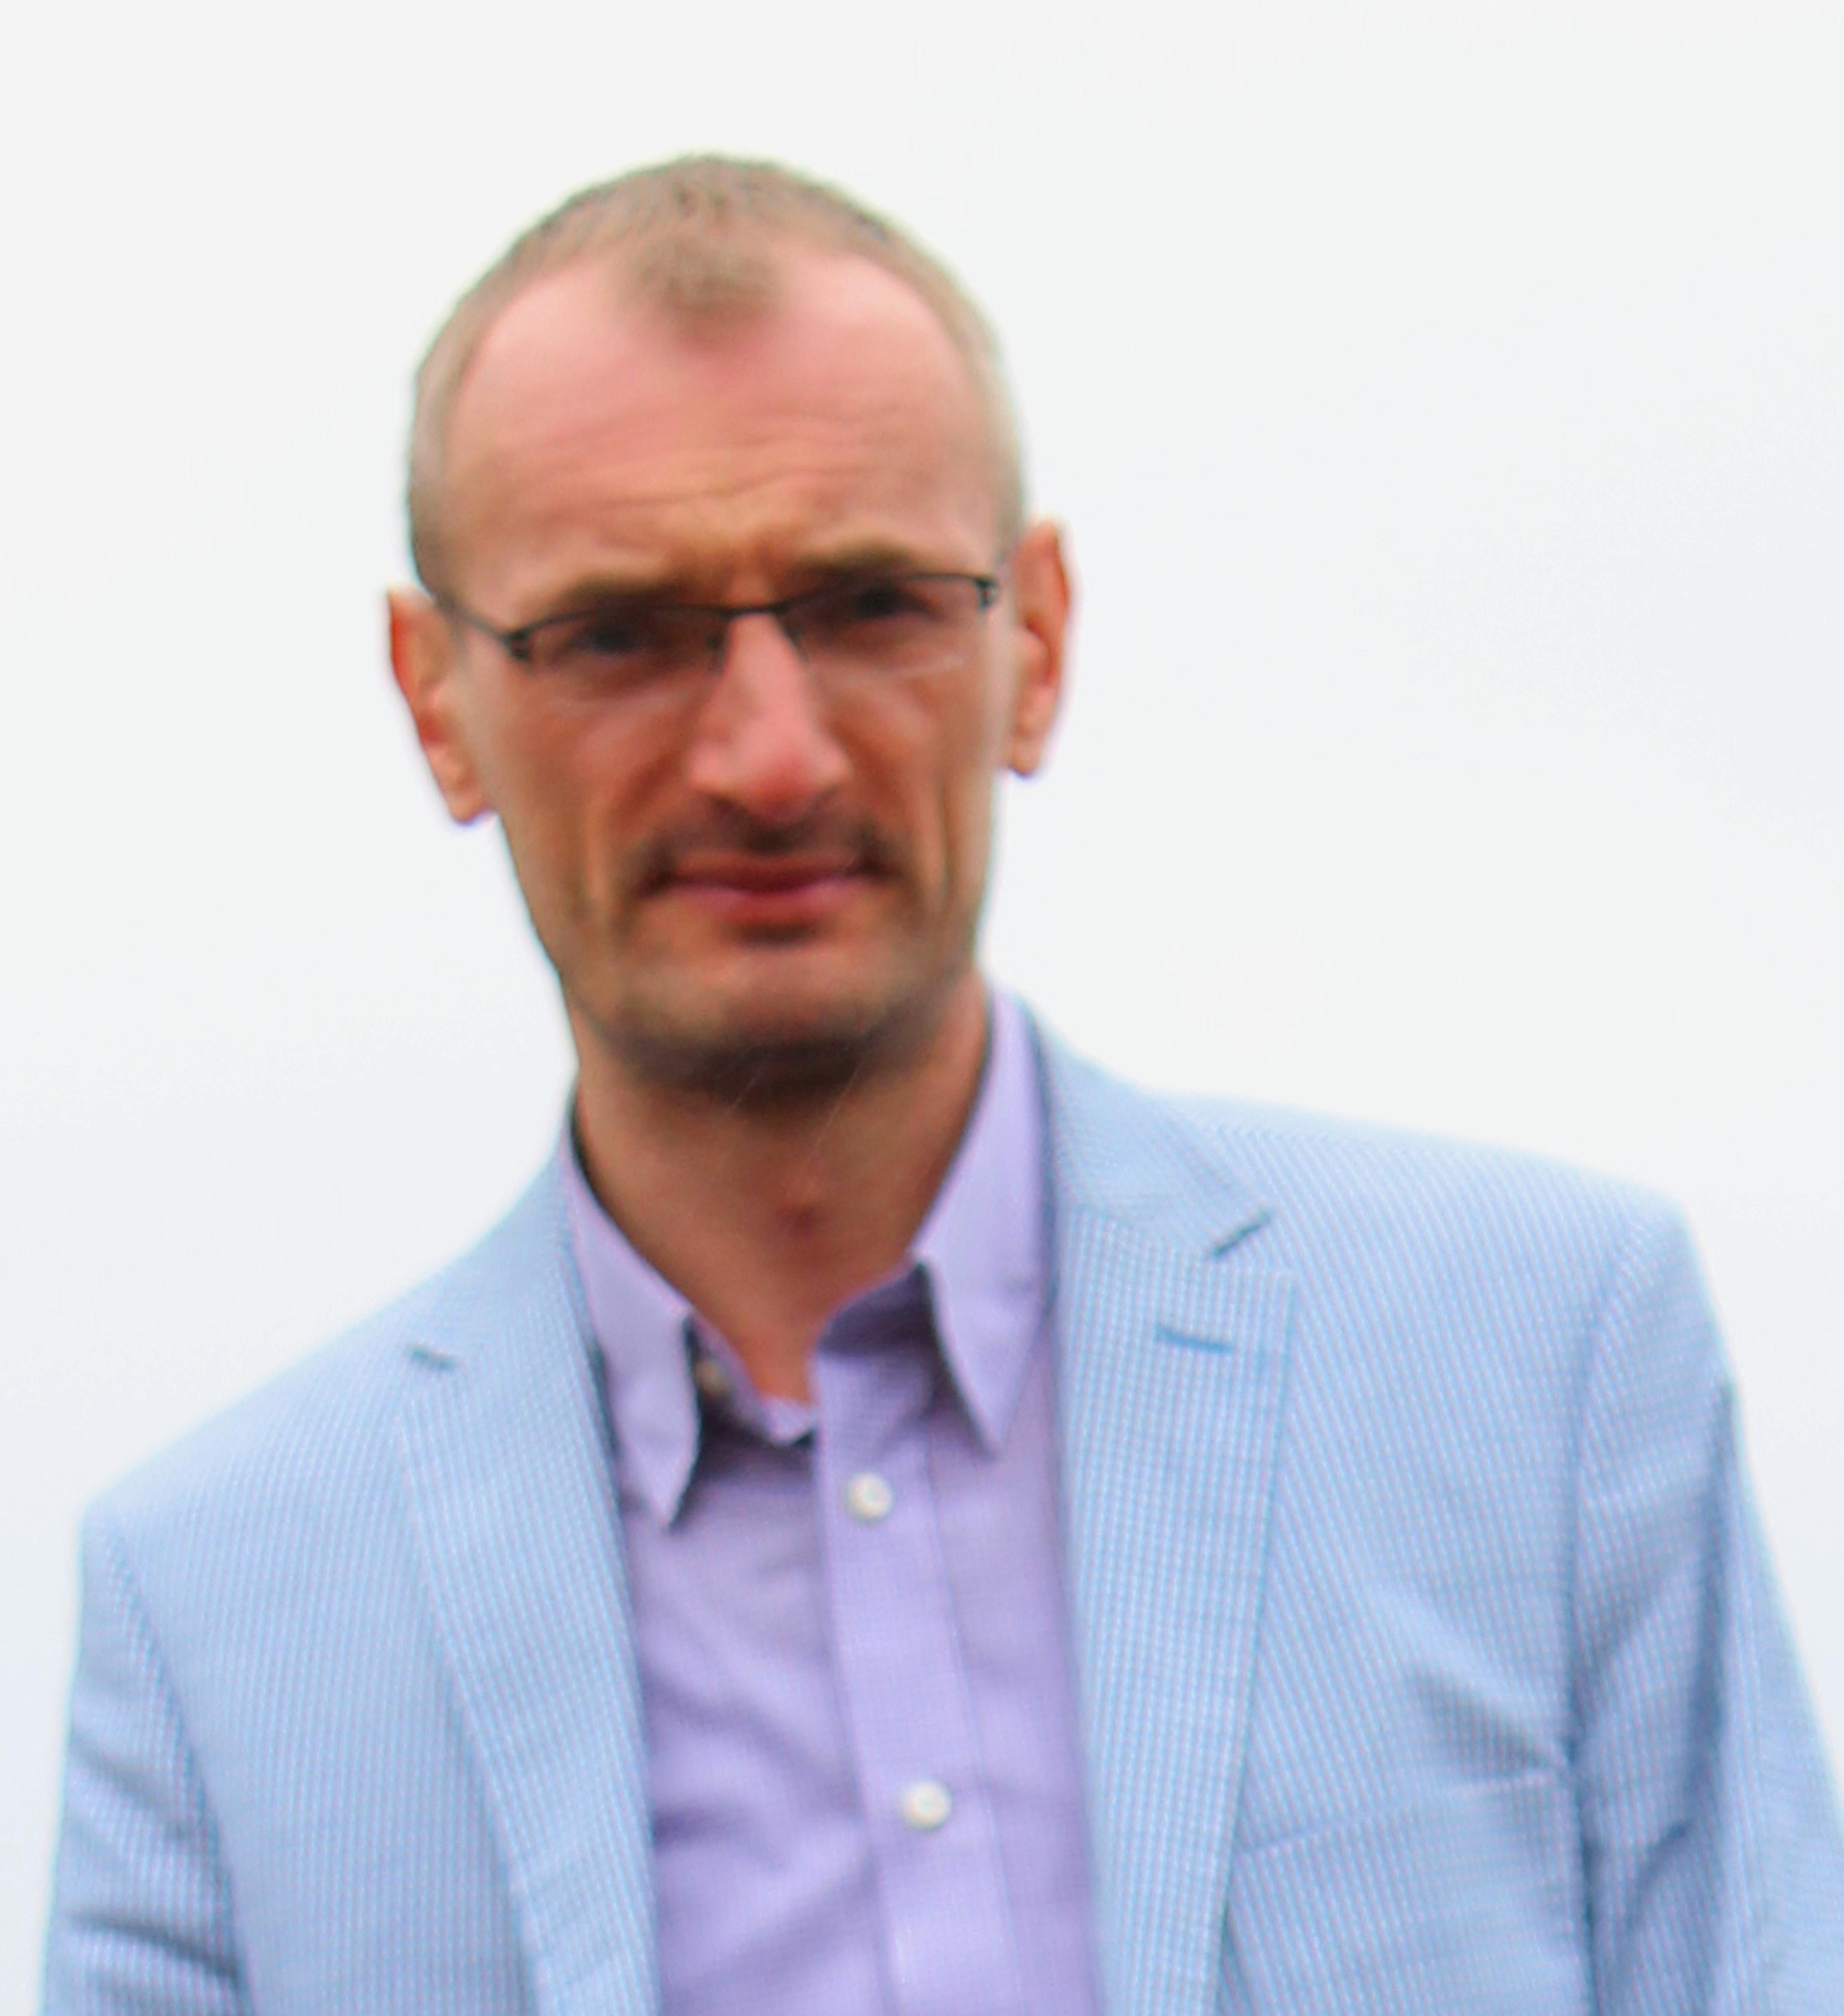 Dr. hab. Mariusz Cycoń, Ph.D.